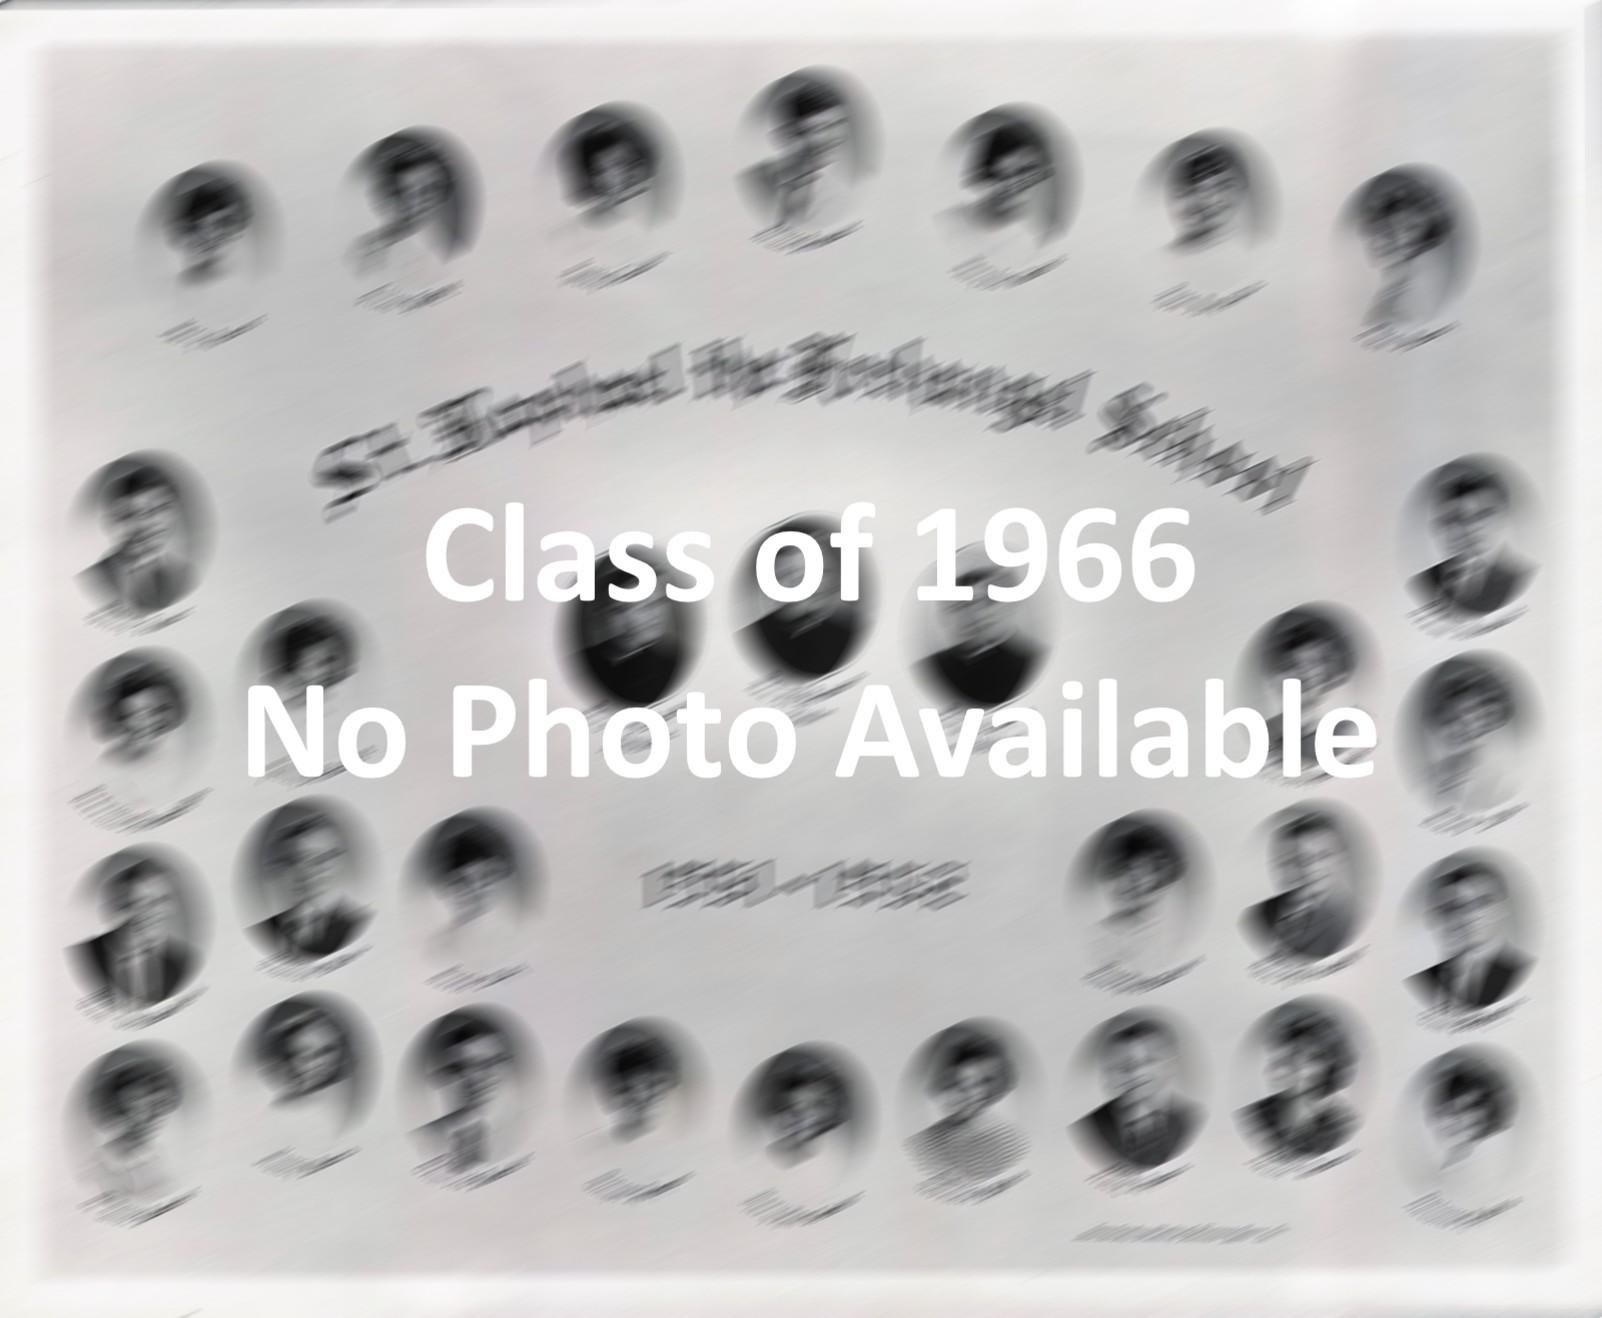 Graduation Class of 1966